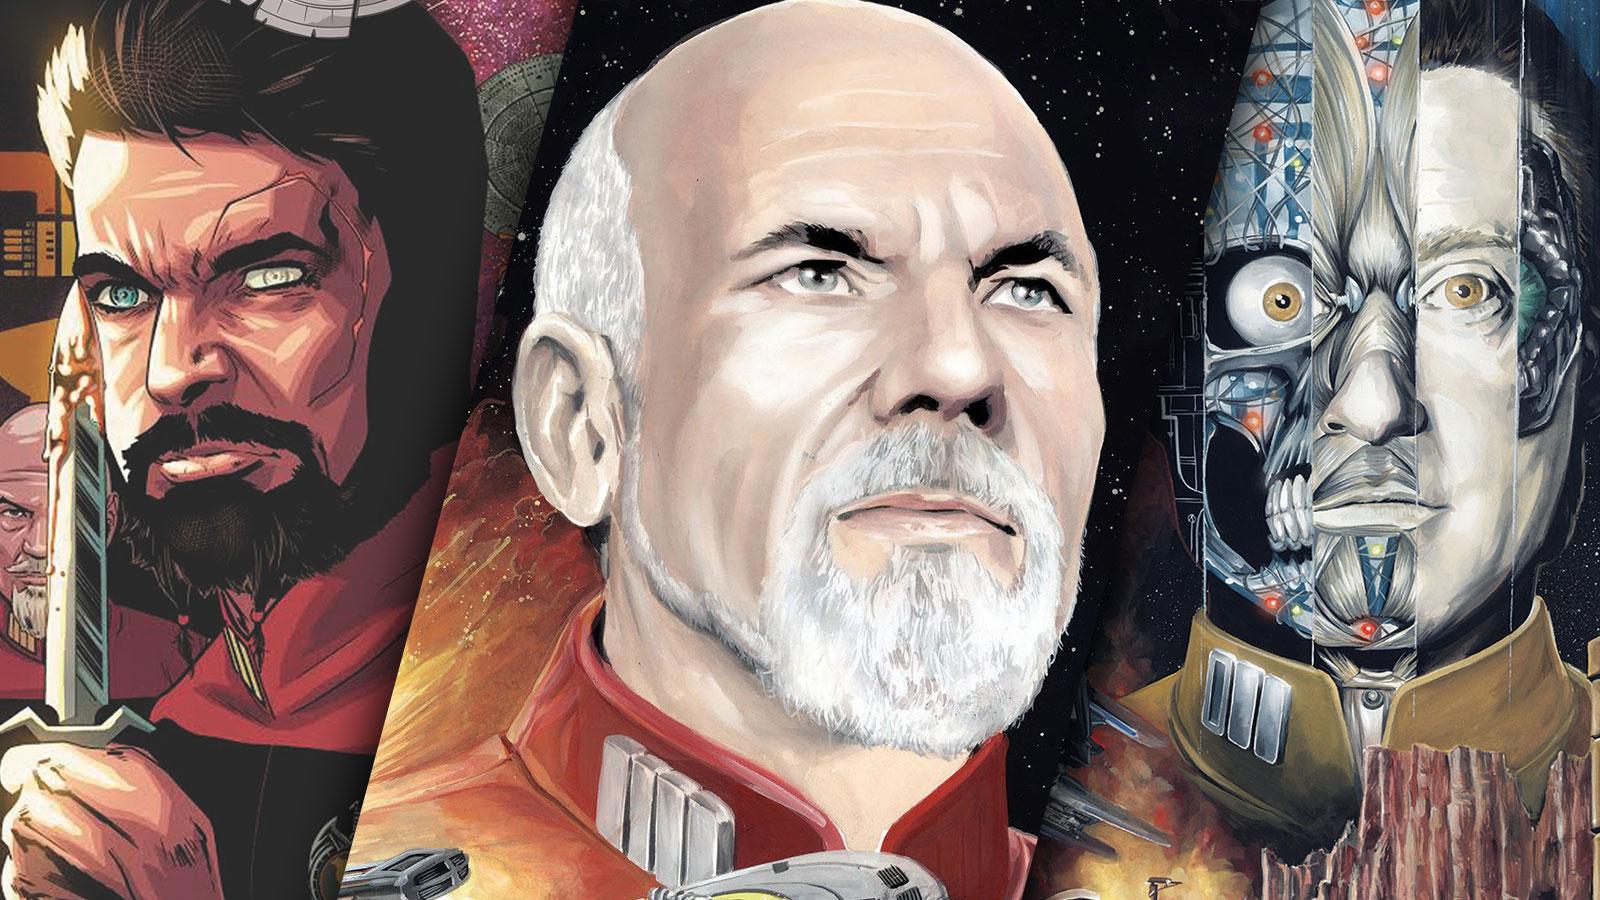 Star Trek Reflections: Looking Back At The 'Mirror Broken' Series